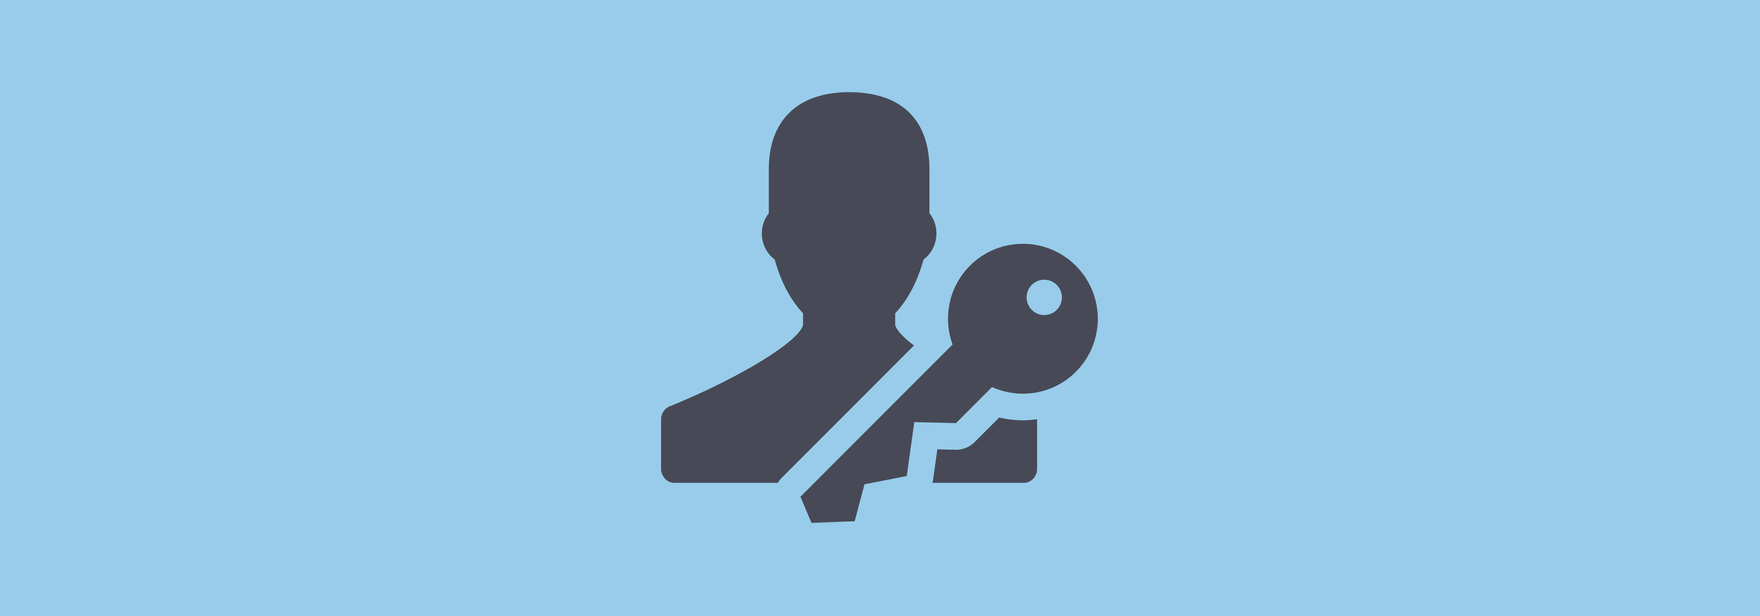 Авторизация с помощью OAuth 2.0 на Go